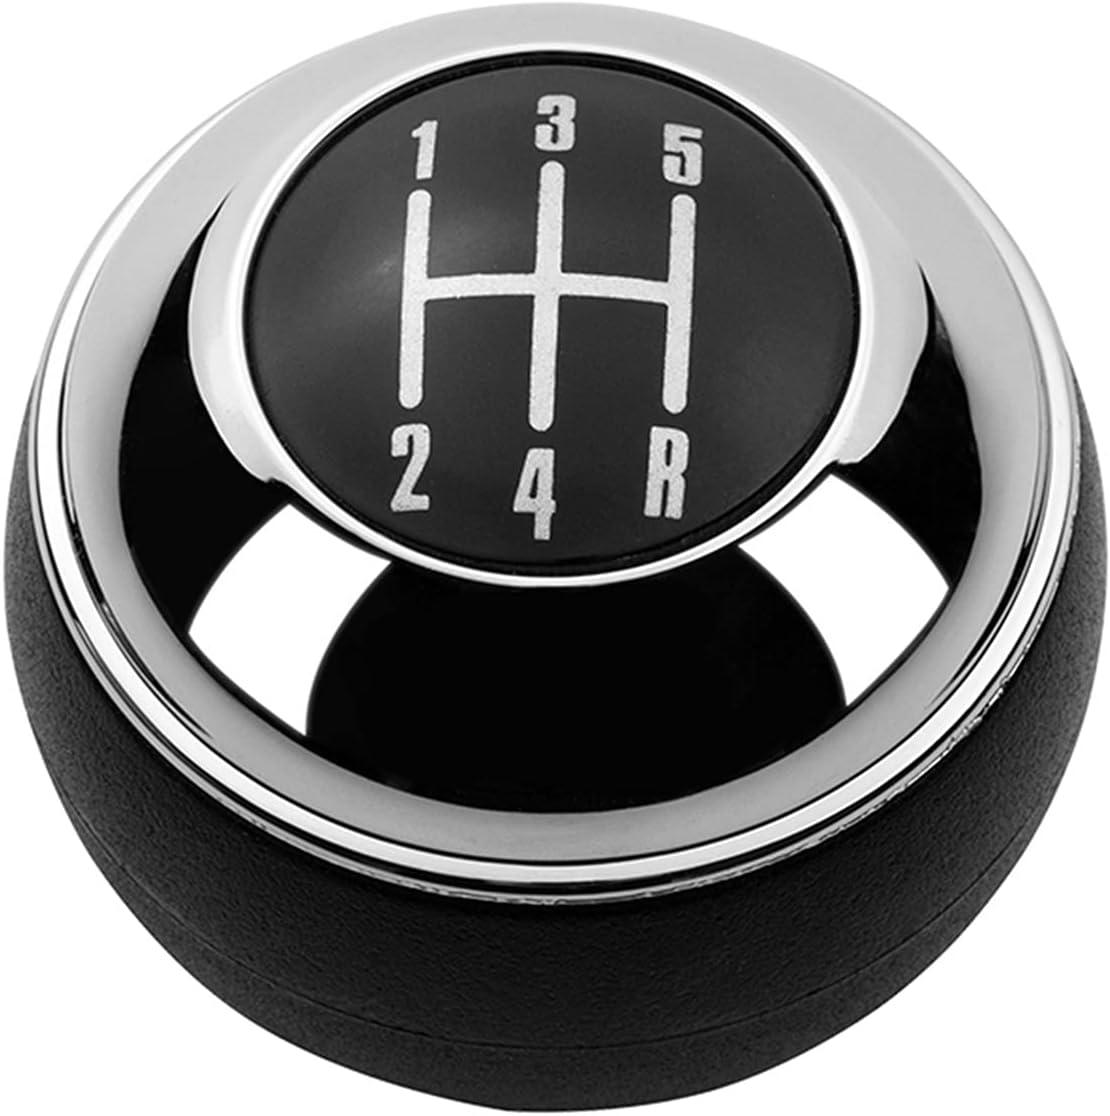 Meas 5/6 velocidades cromadas Engranaje Negro Mando de Cambio Palanca de Palanca de Palanca de Palanca para Mini r50 uno D R52 R53 Cooper S 3 Puertas 2001 2002 2003-2008 (Color Name : Black 5 Speed)